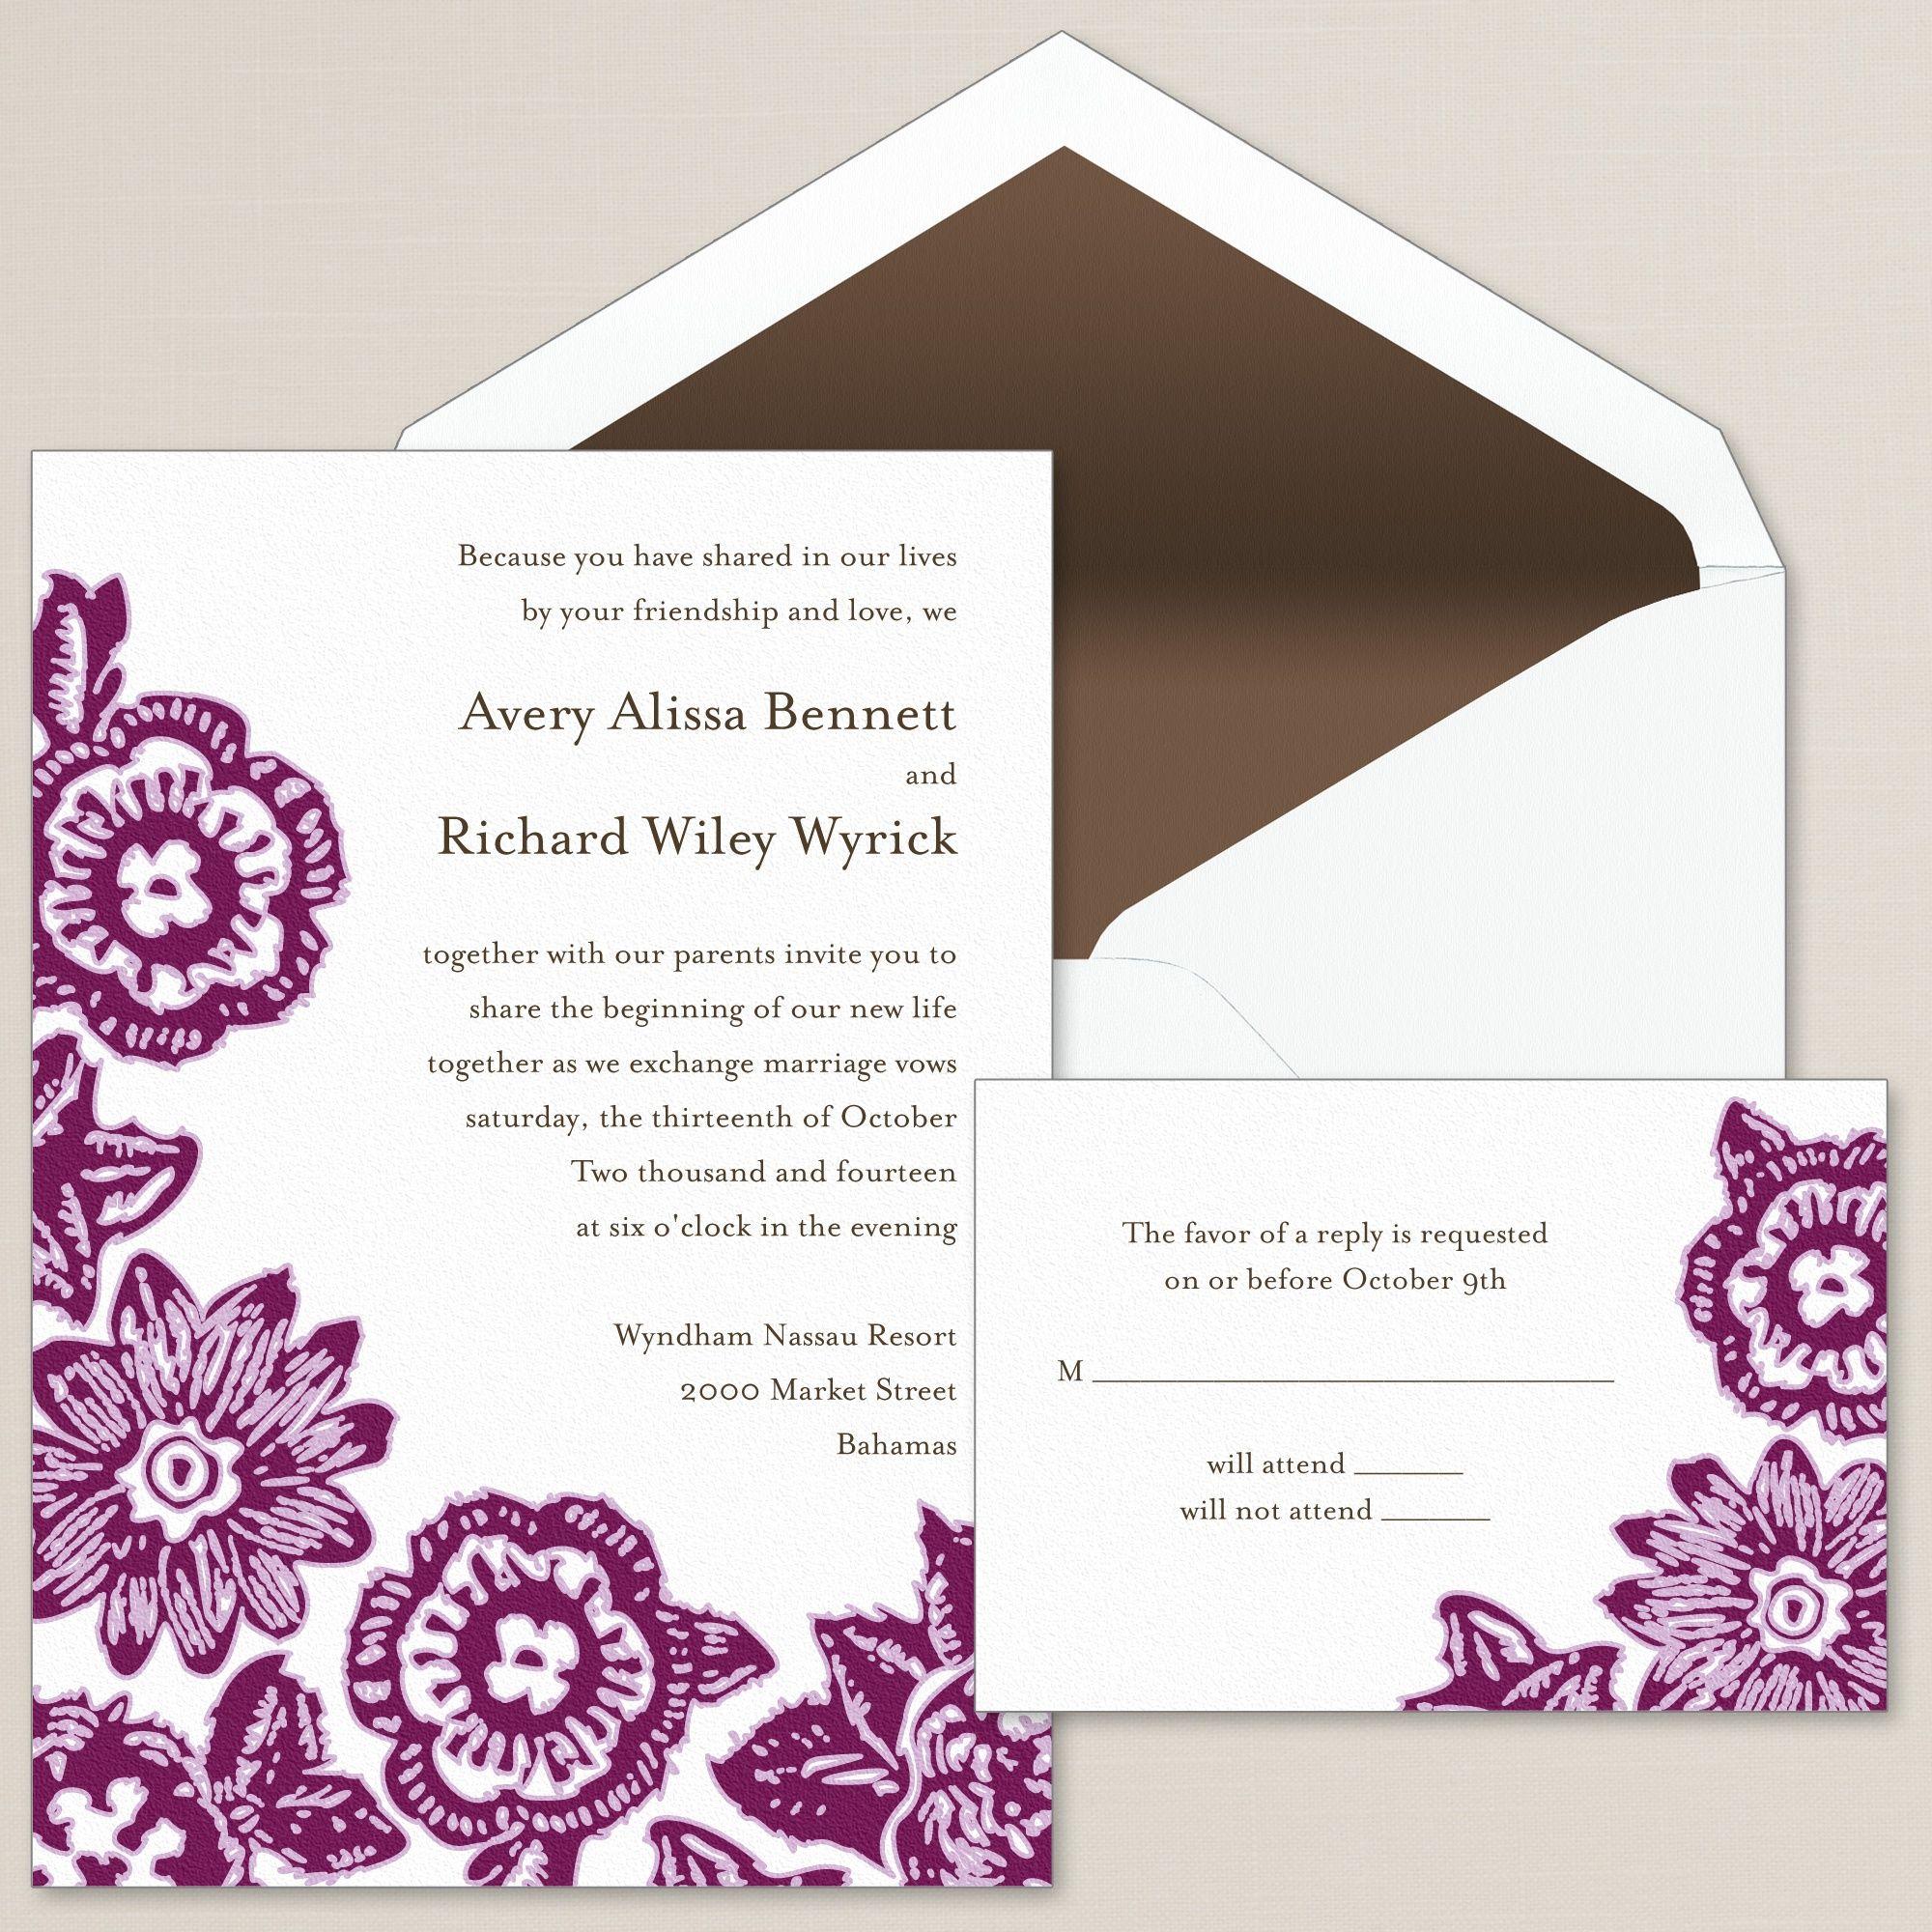 Everlasting Love Wedding Invitation